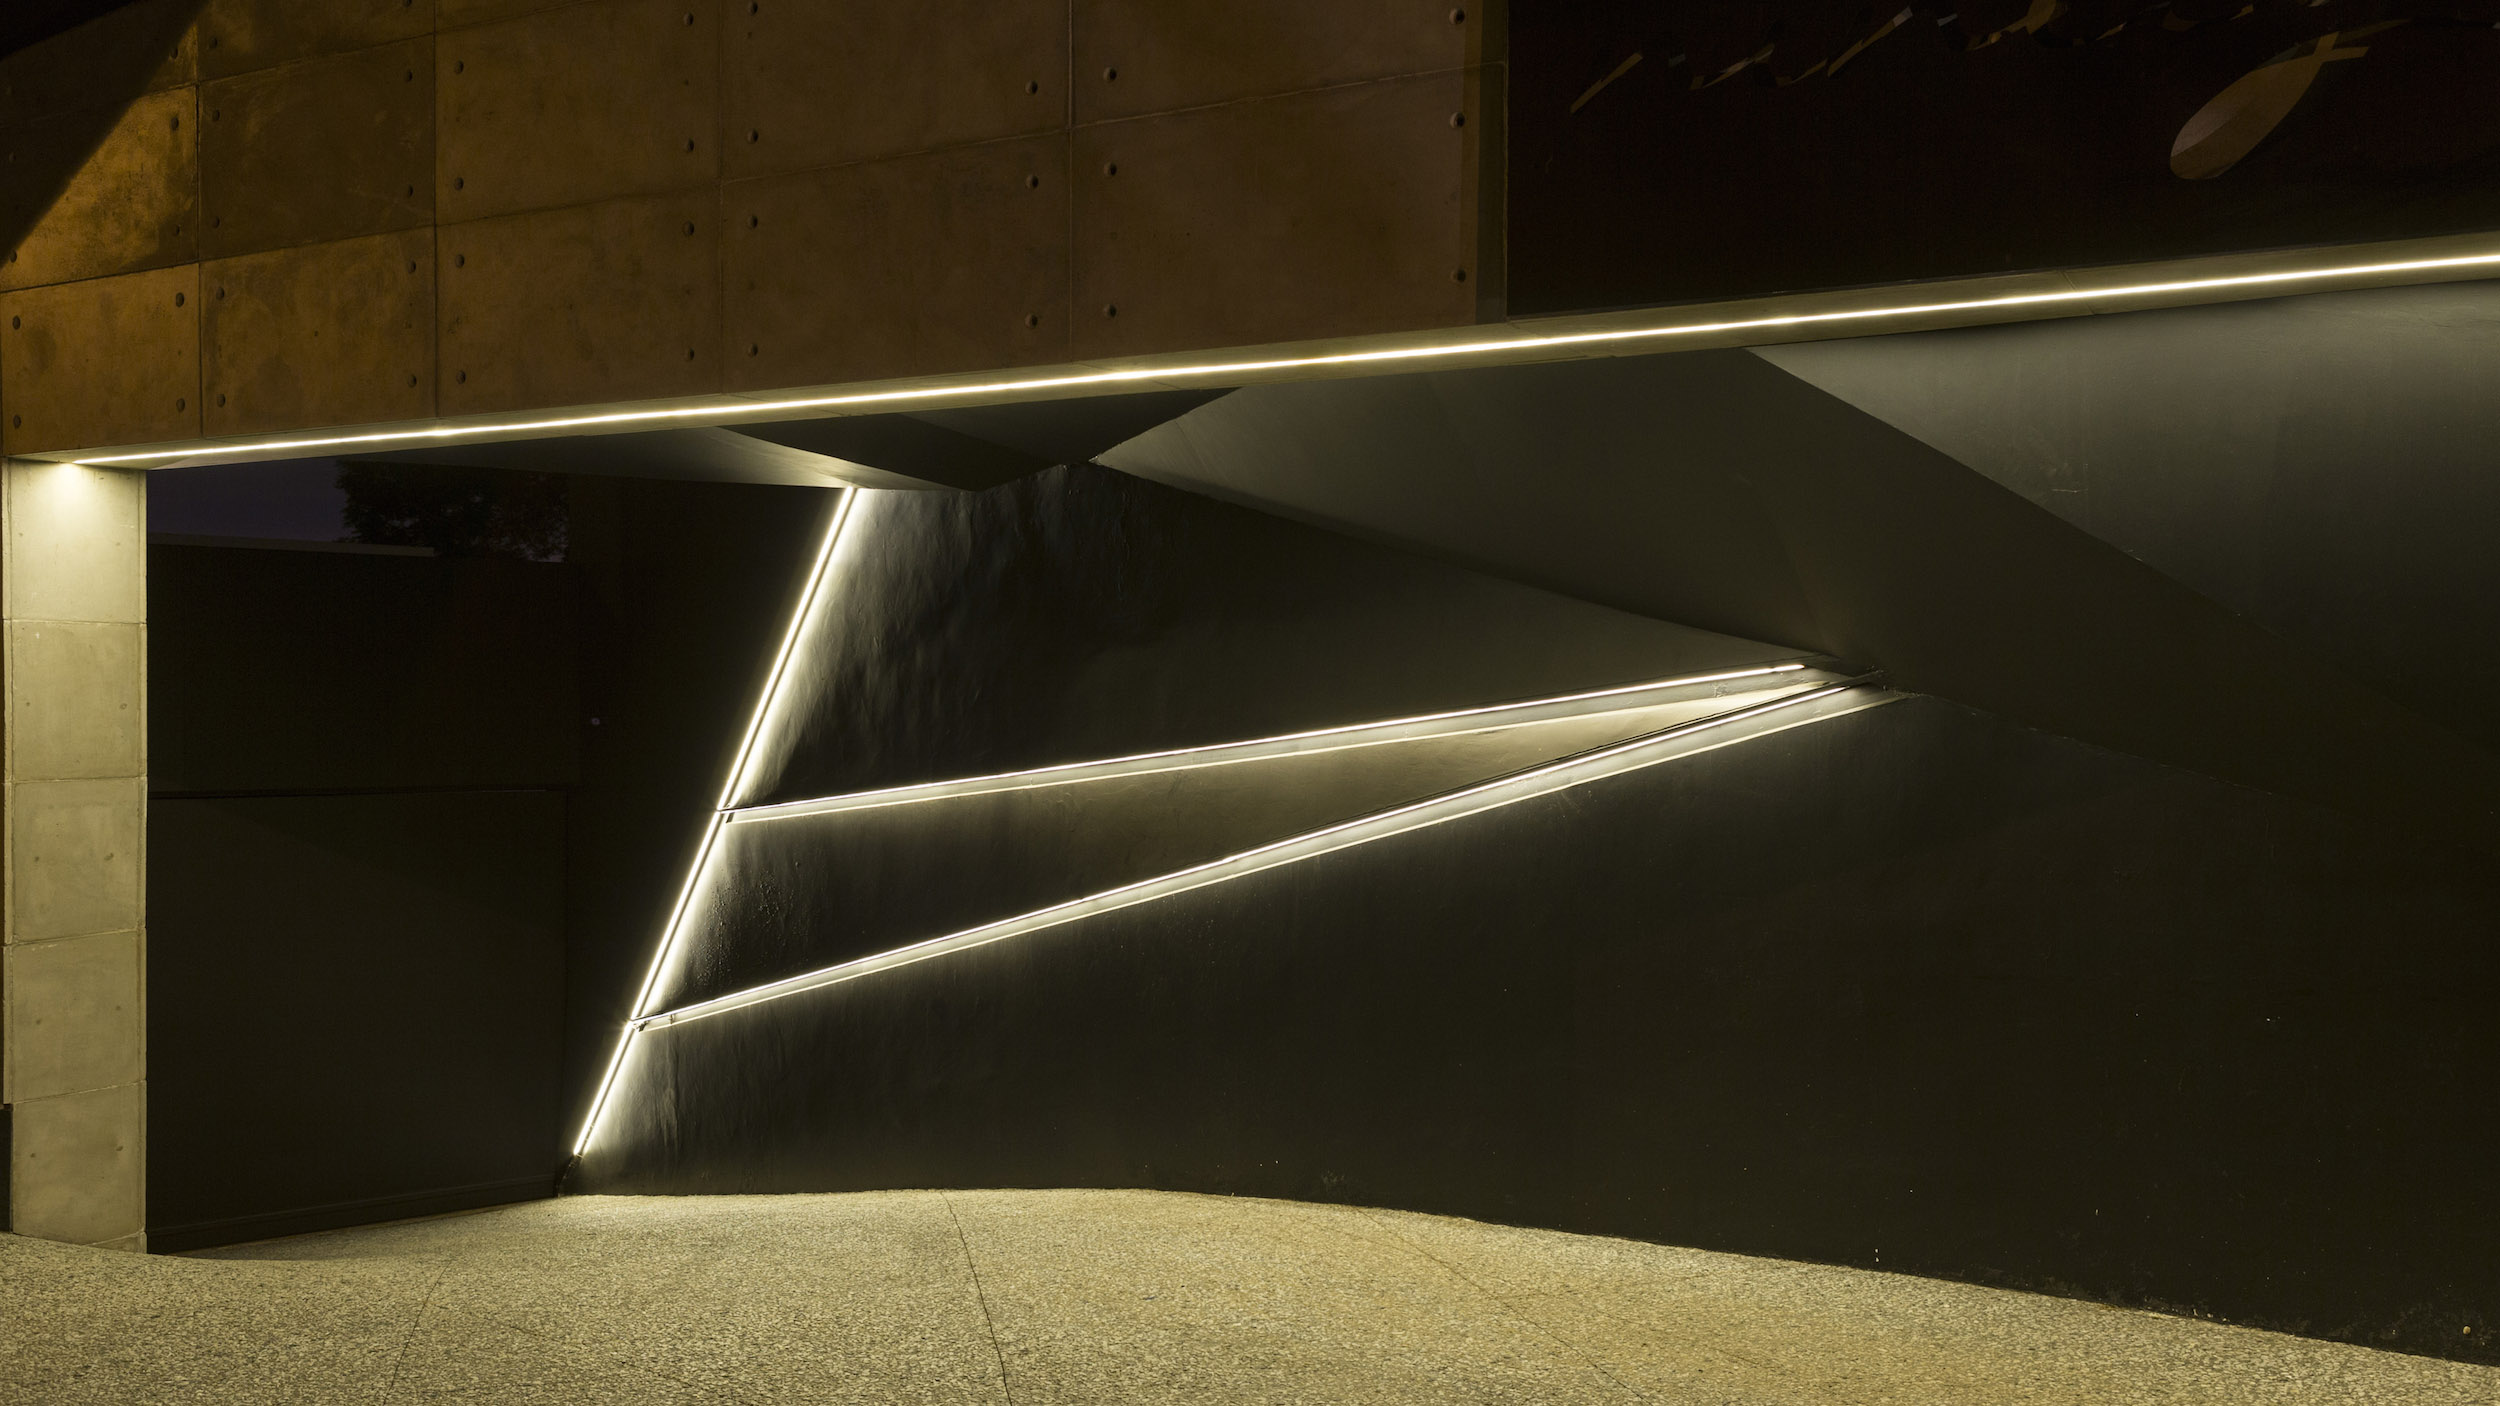 Kloof Road Masterpiece House in Johannesburg by Nico van der Meulen Architects-02